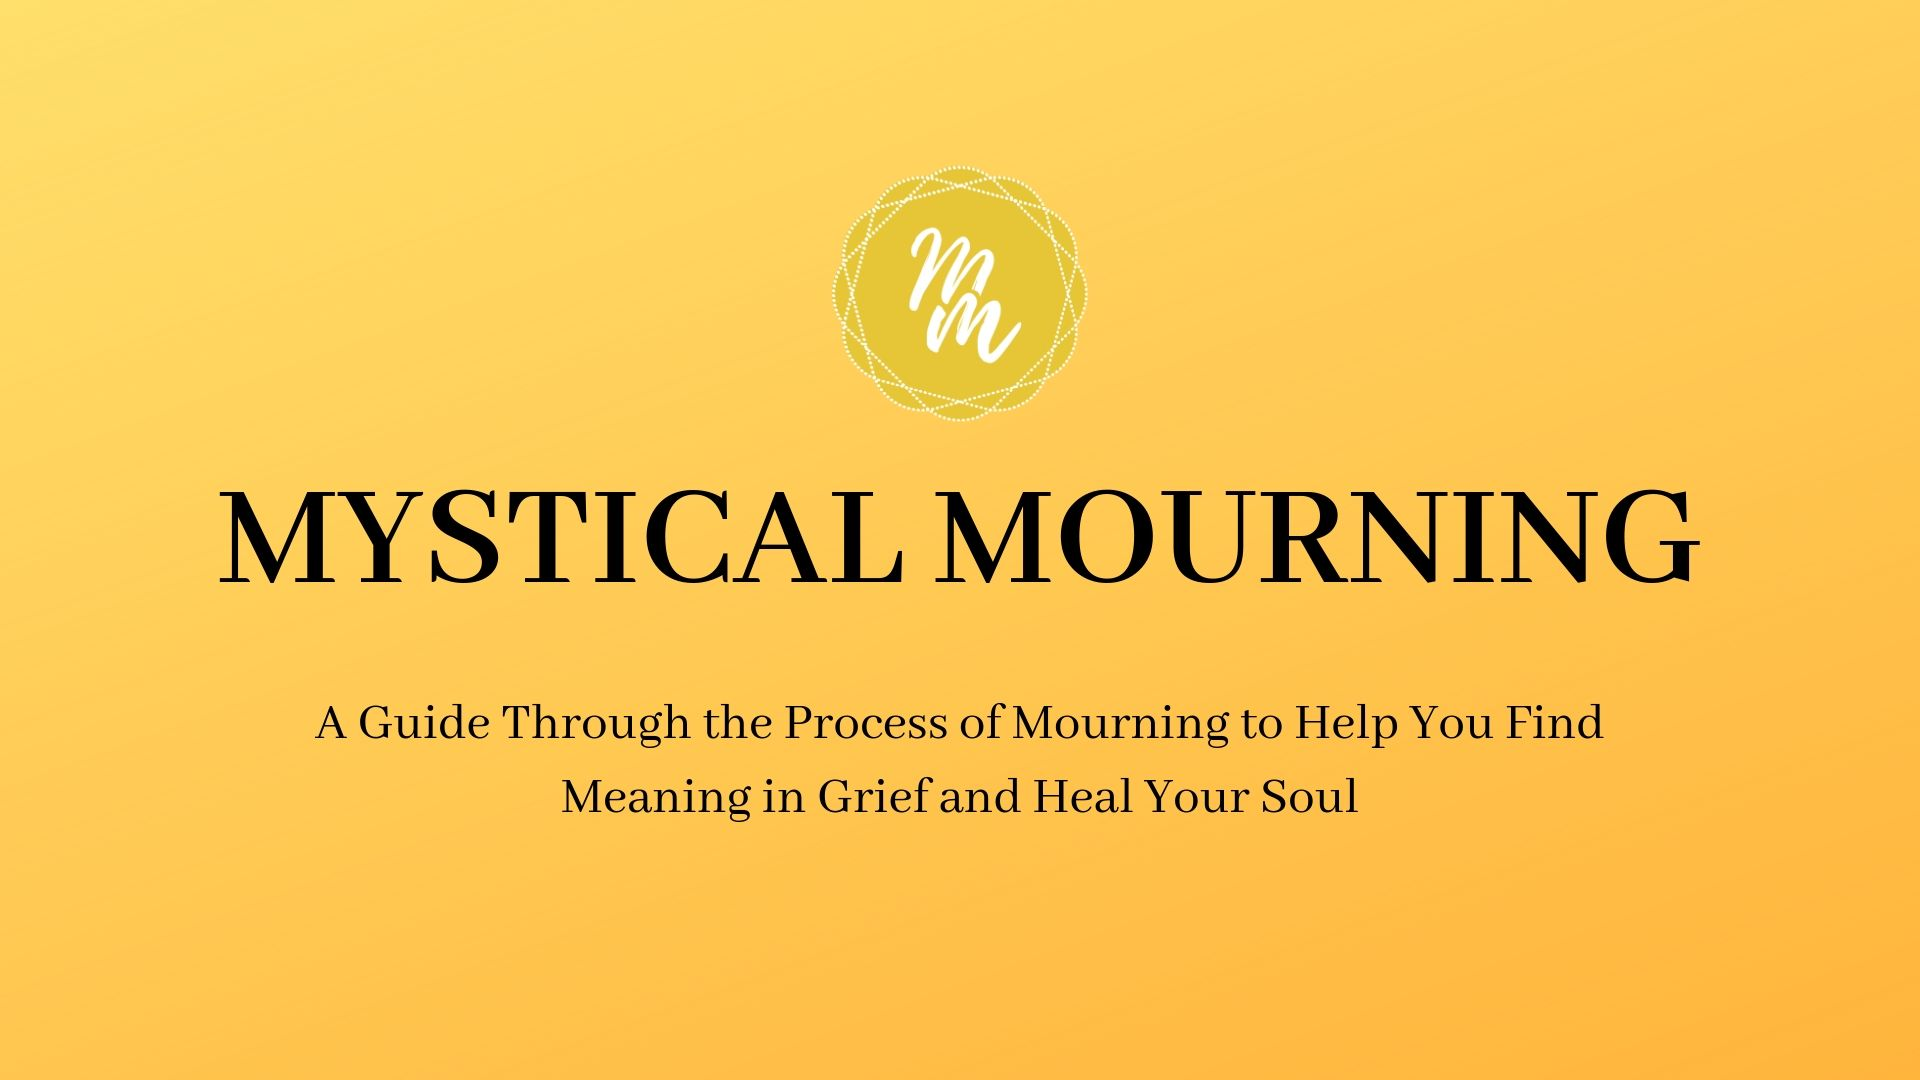 MYSTICAL MOURNING.jpg